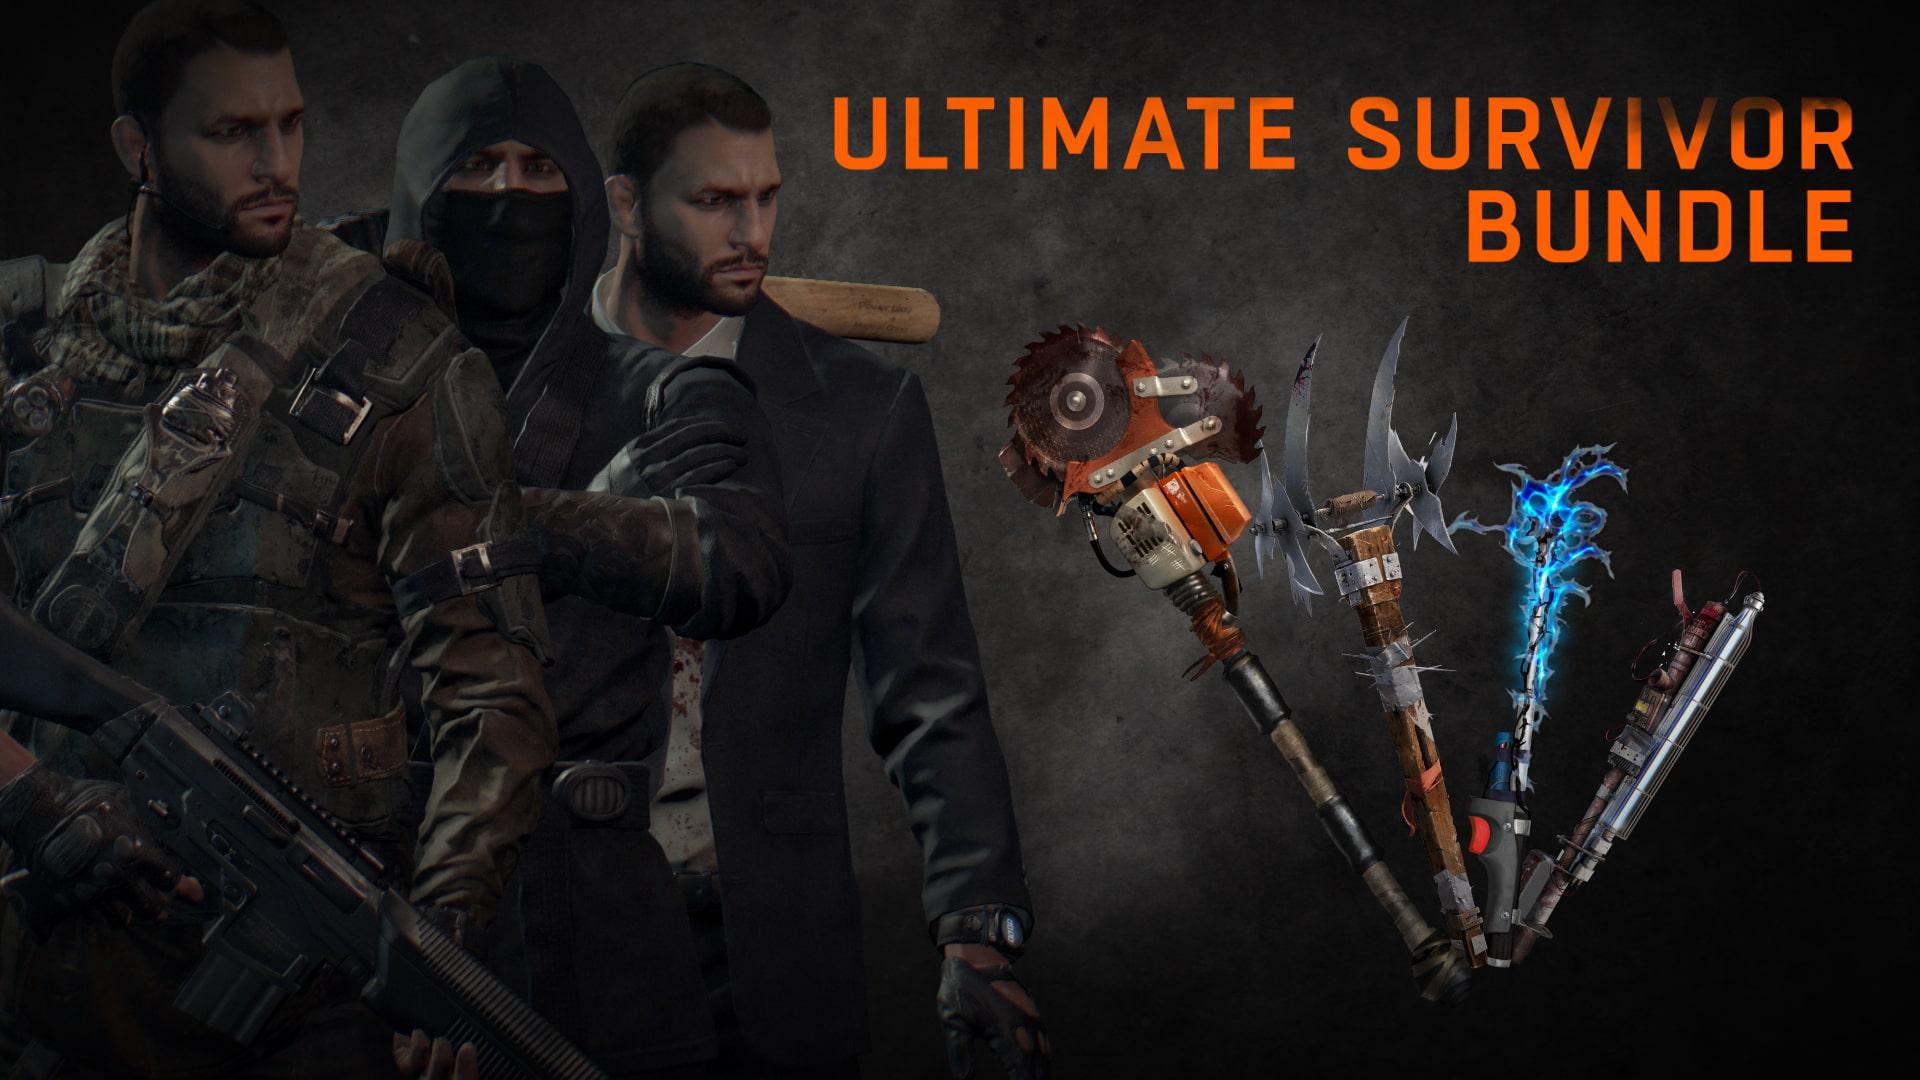 Dying Light - Ultimate Survivor Bundle | WW (354a018f-f2c7-4bf9-99fa-a4f765cf67cd)